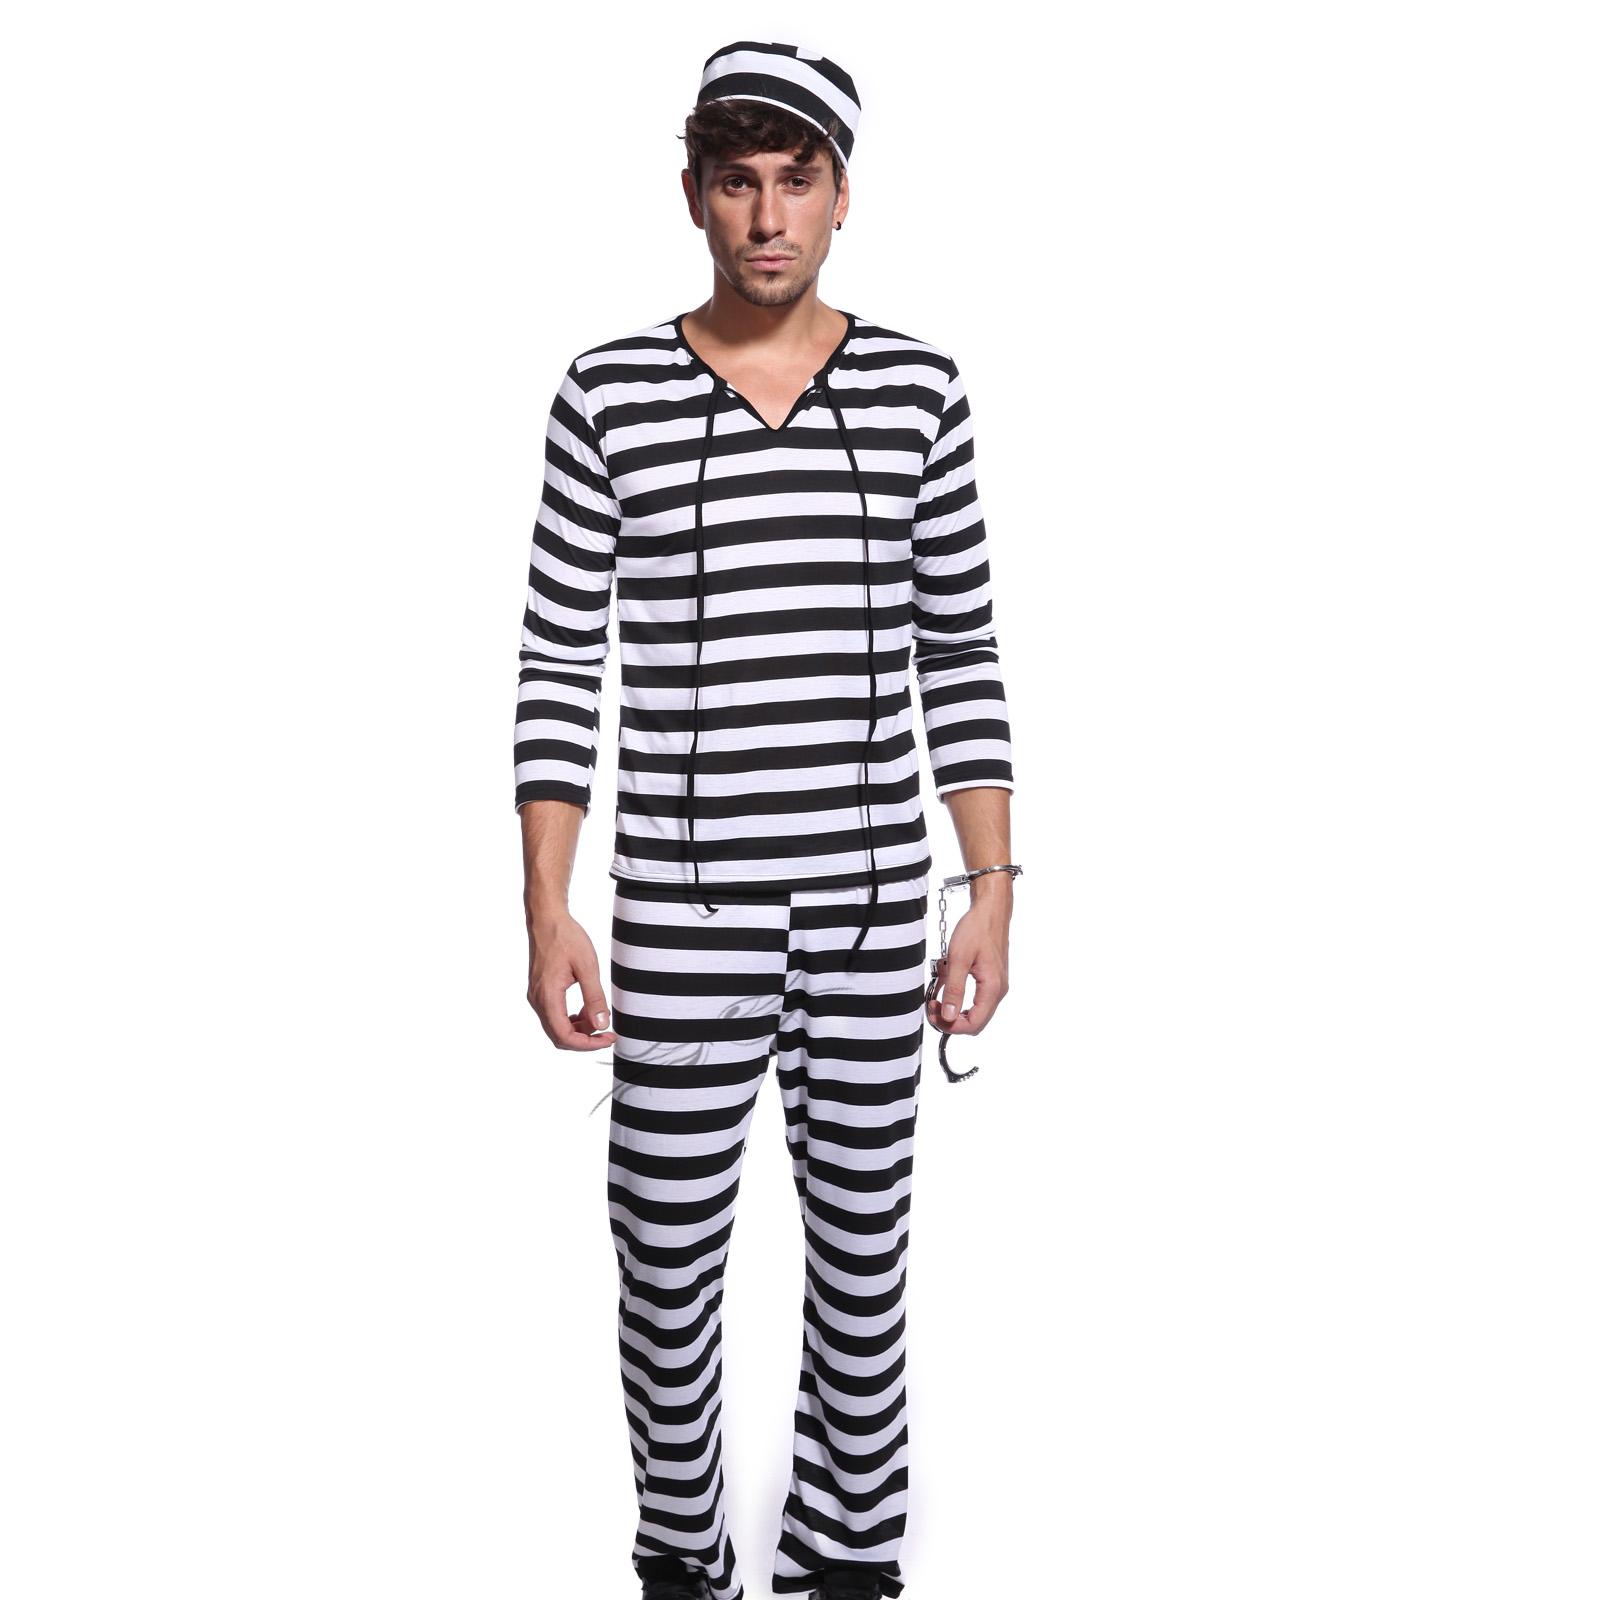 Prisoner Fancy Dress Costume Halloween Convict Jail Adult Outfit